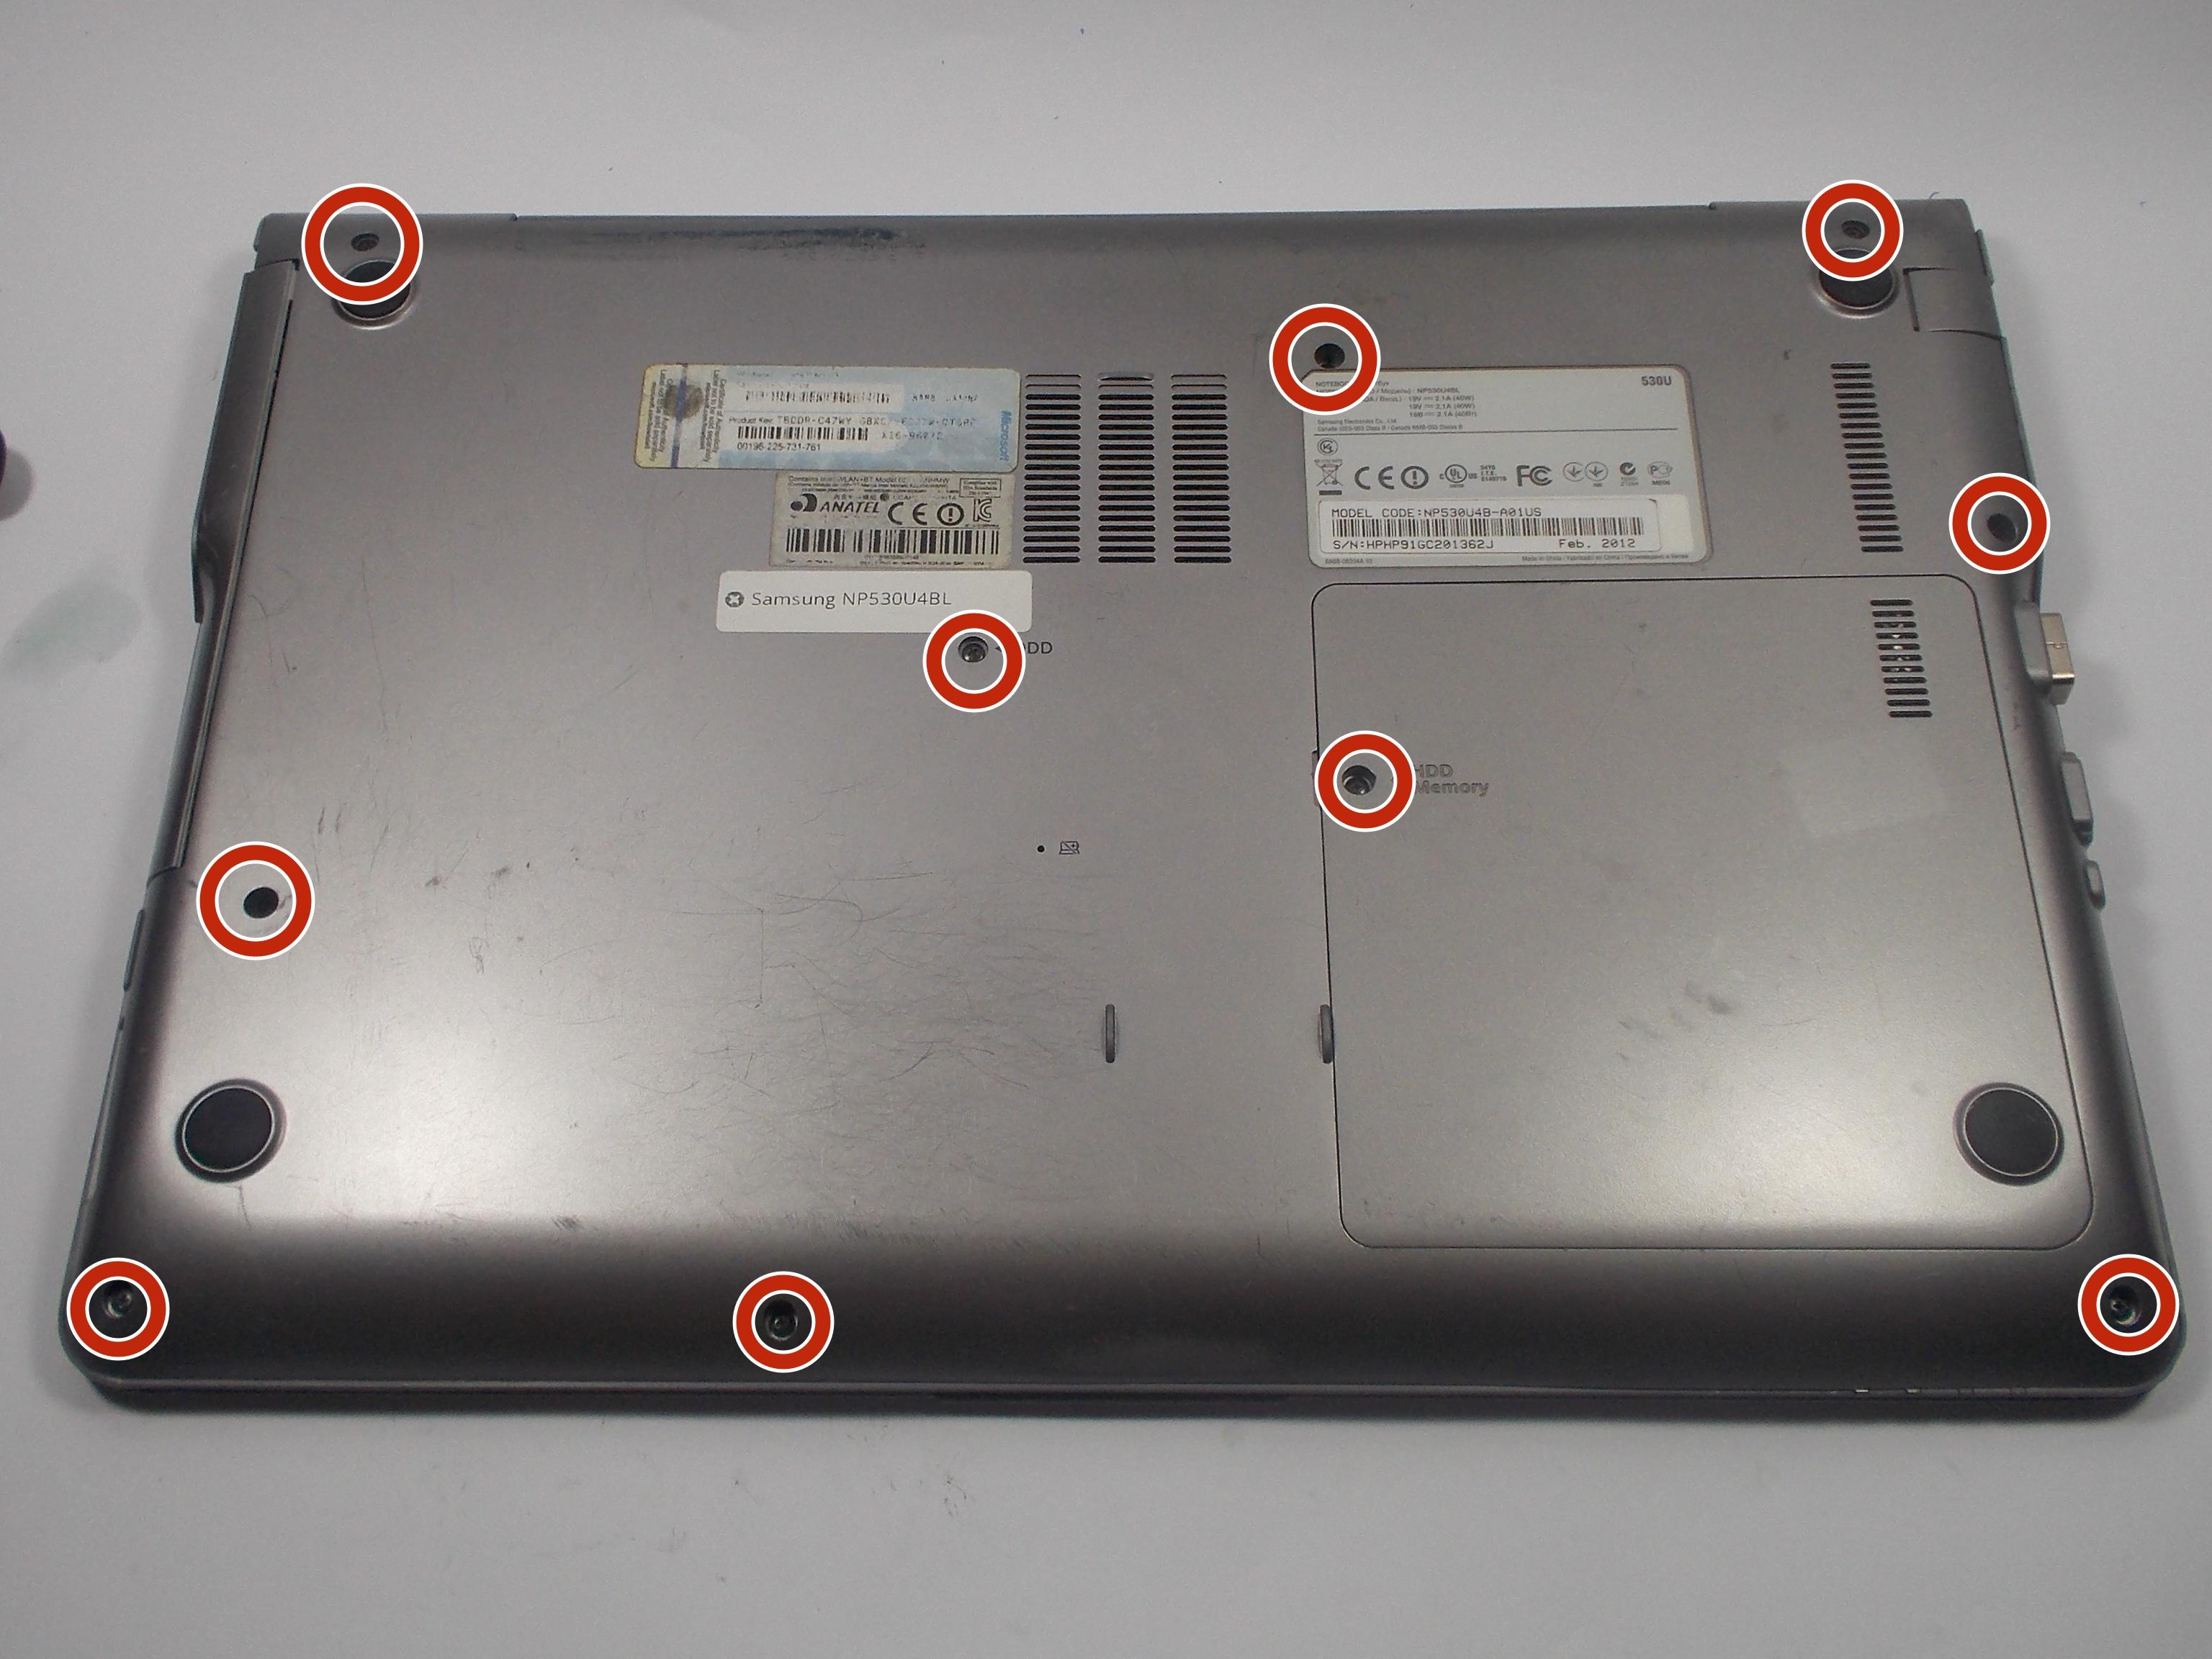 Samsung NP530U4BL Снятие задней крышки